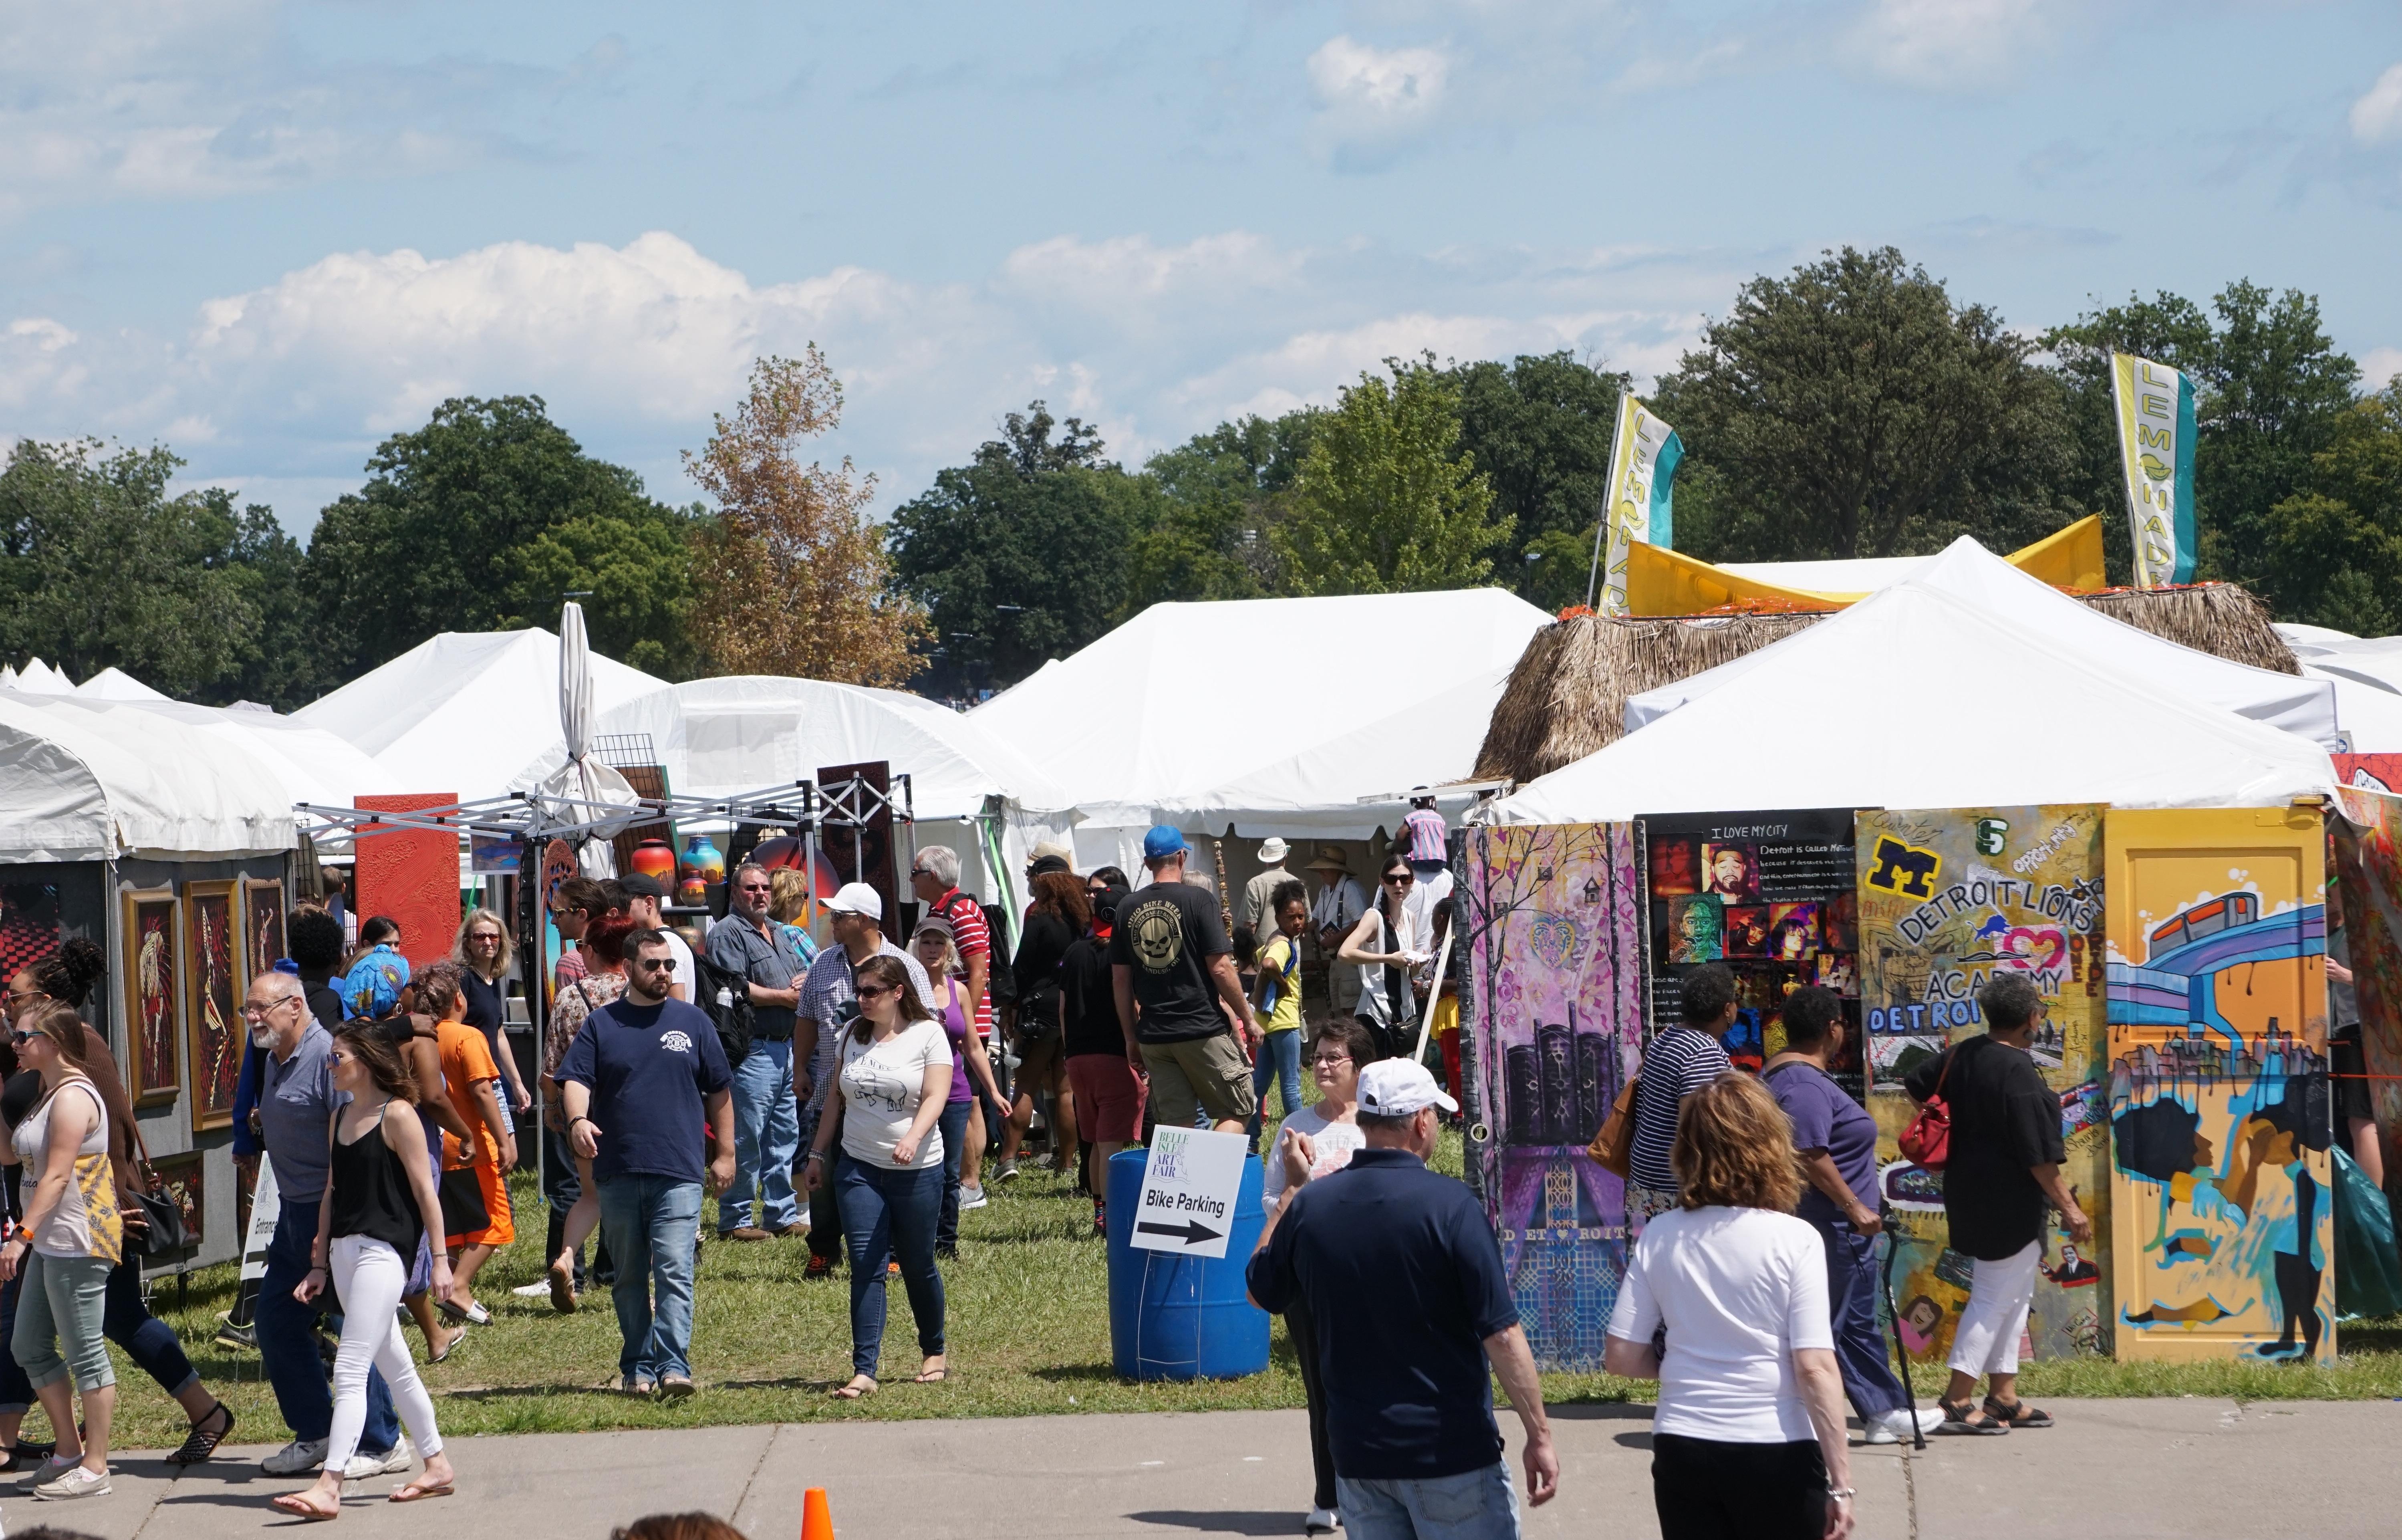 Belle Isle Art Fair • Aug. 7-8, 2021